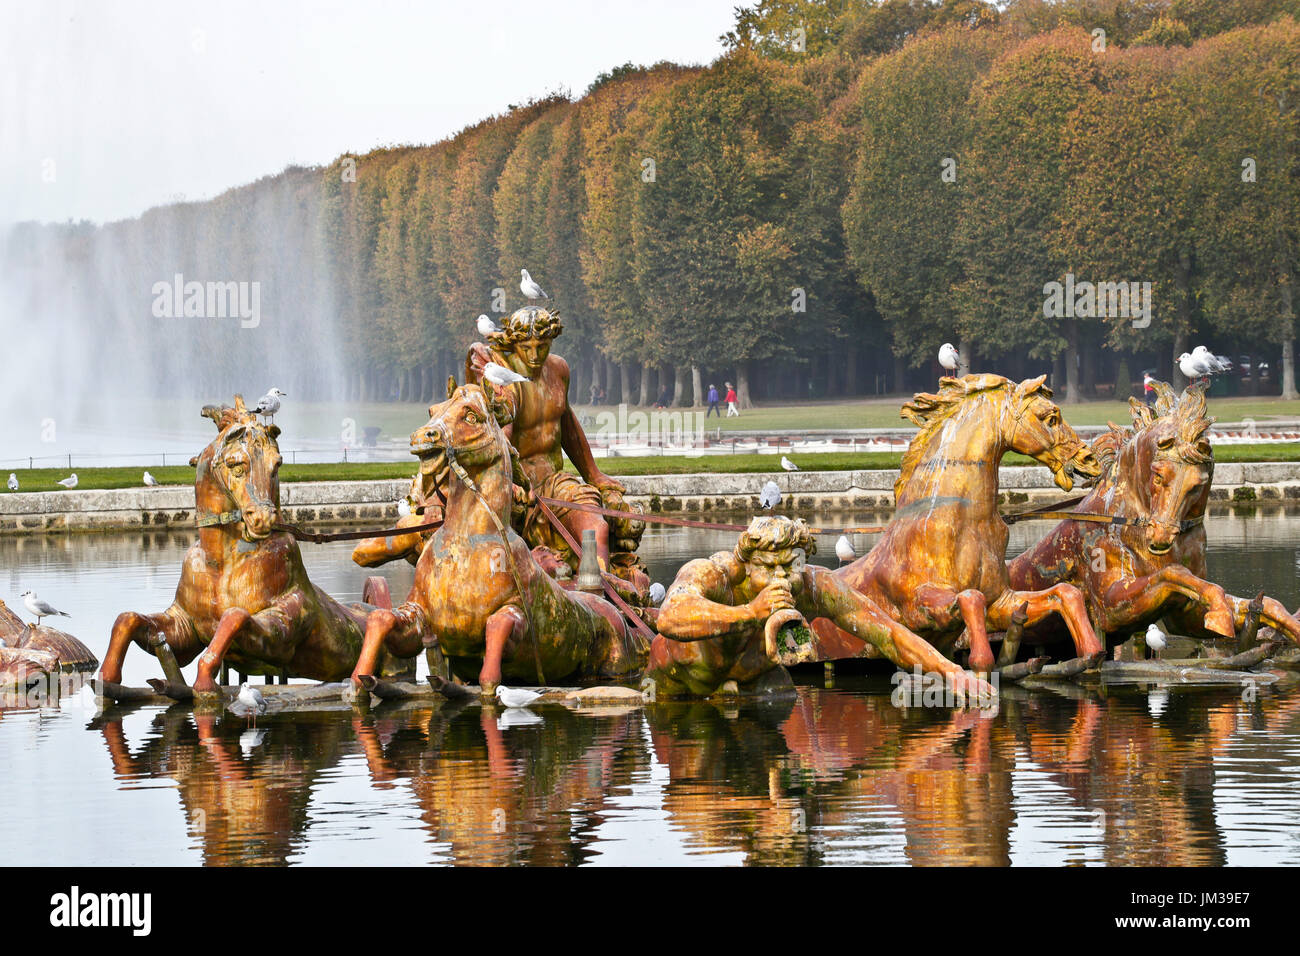 Gardens of Versailles, Palace of Versailles, UNESCO World Heritage Site, Yvelines, Region Ile-de-France, Versailles.France.Apollo fountain - Stock Image